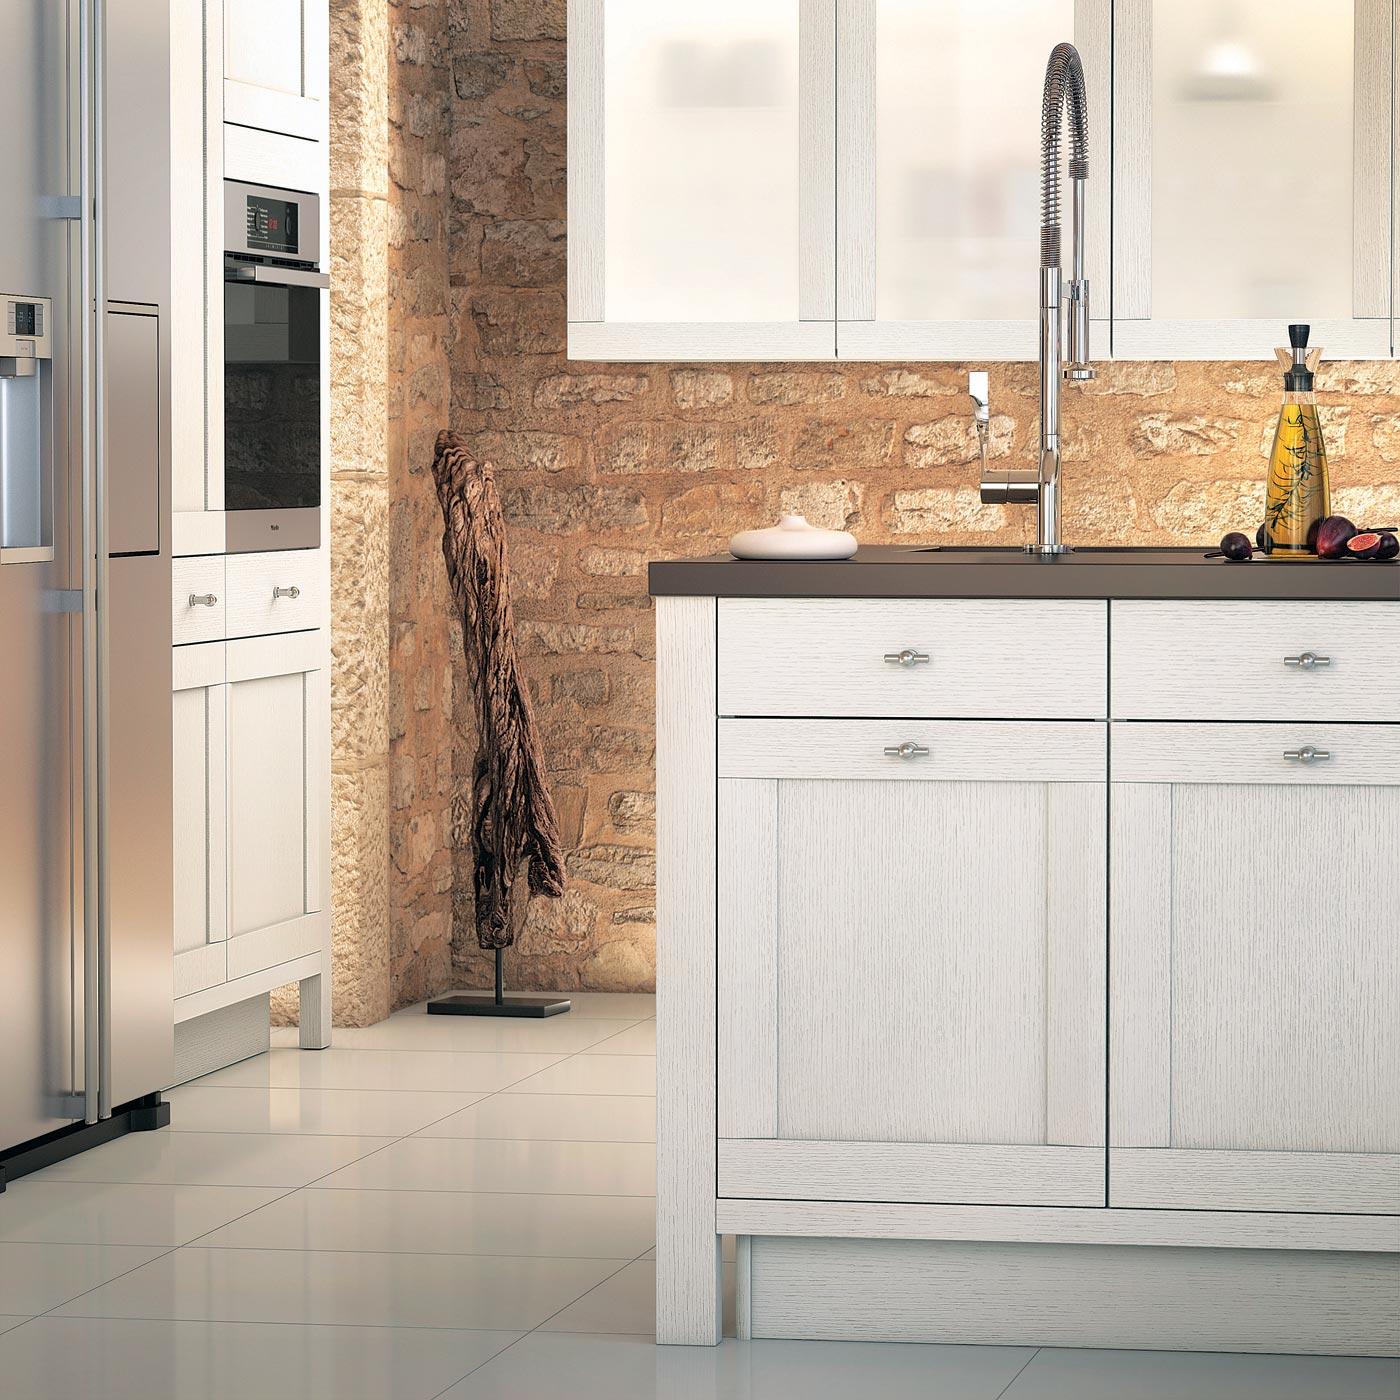 cuisine esquisse ch ne everest perene lyon. Black Bedroom Furniture Sets. Home Design Ideas